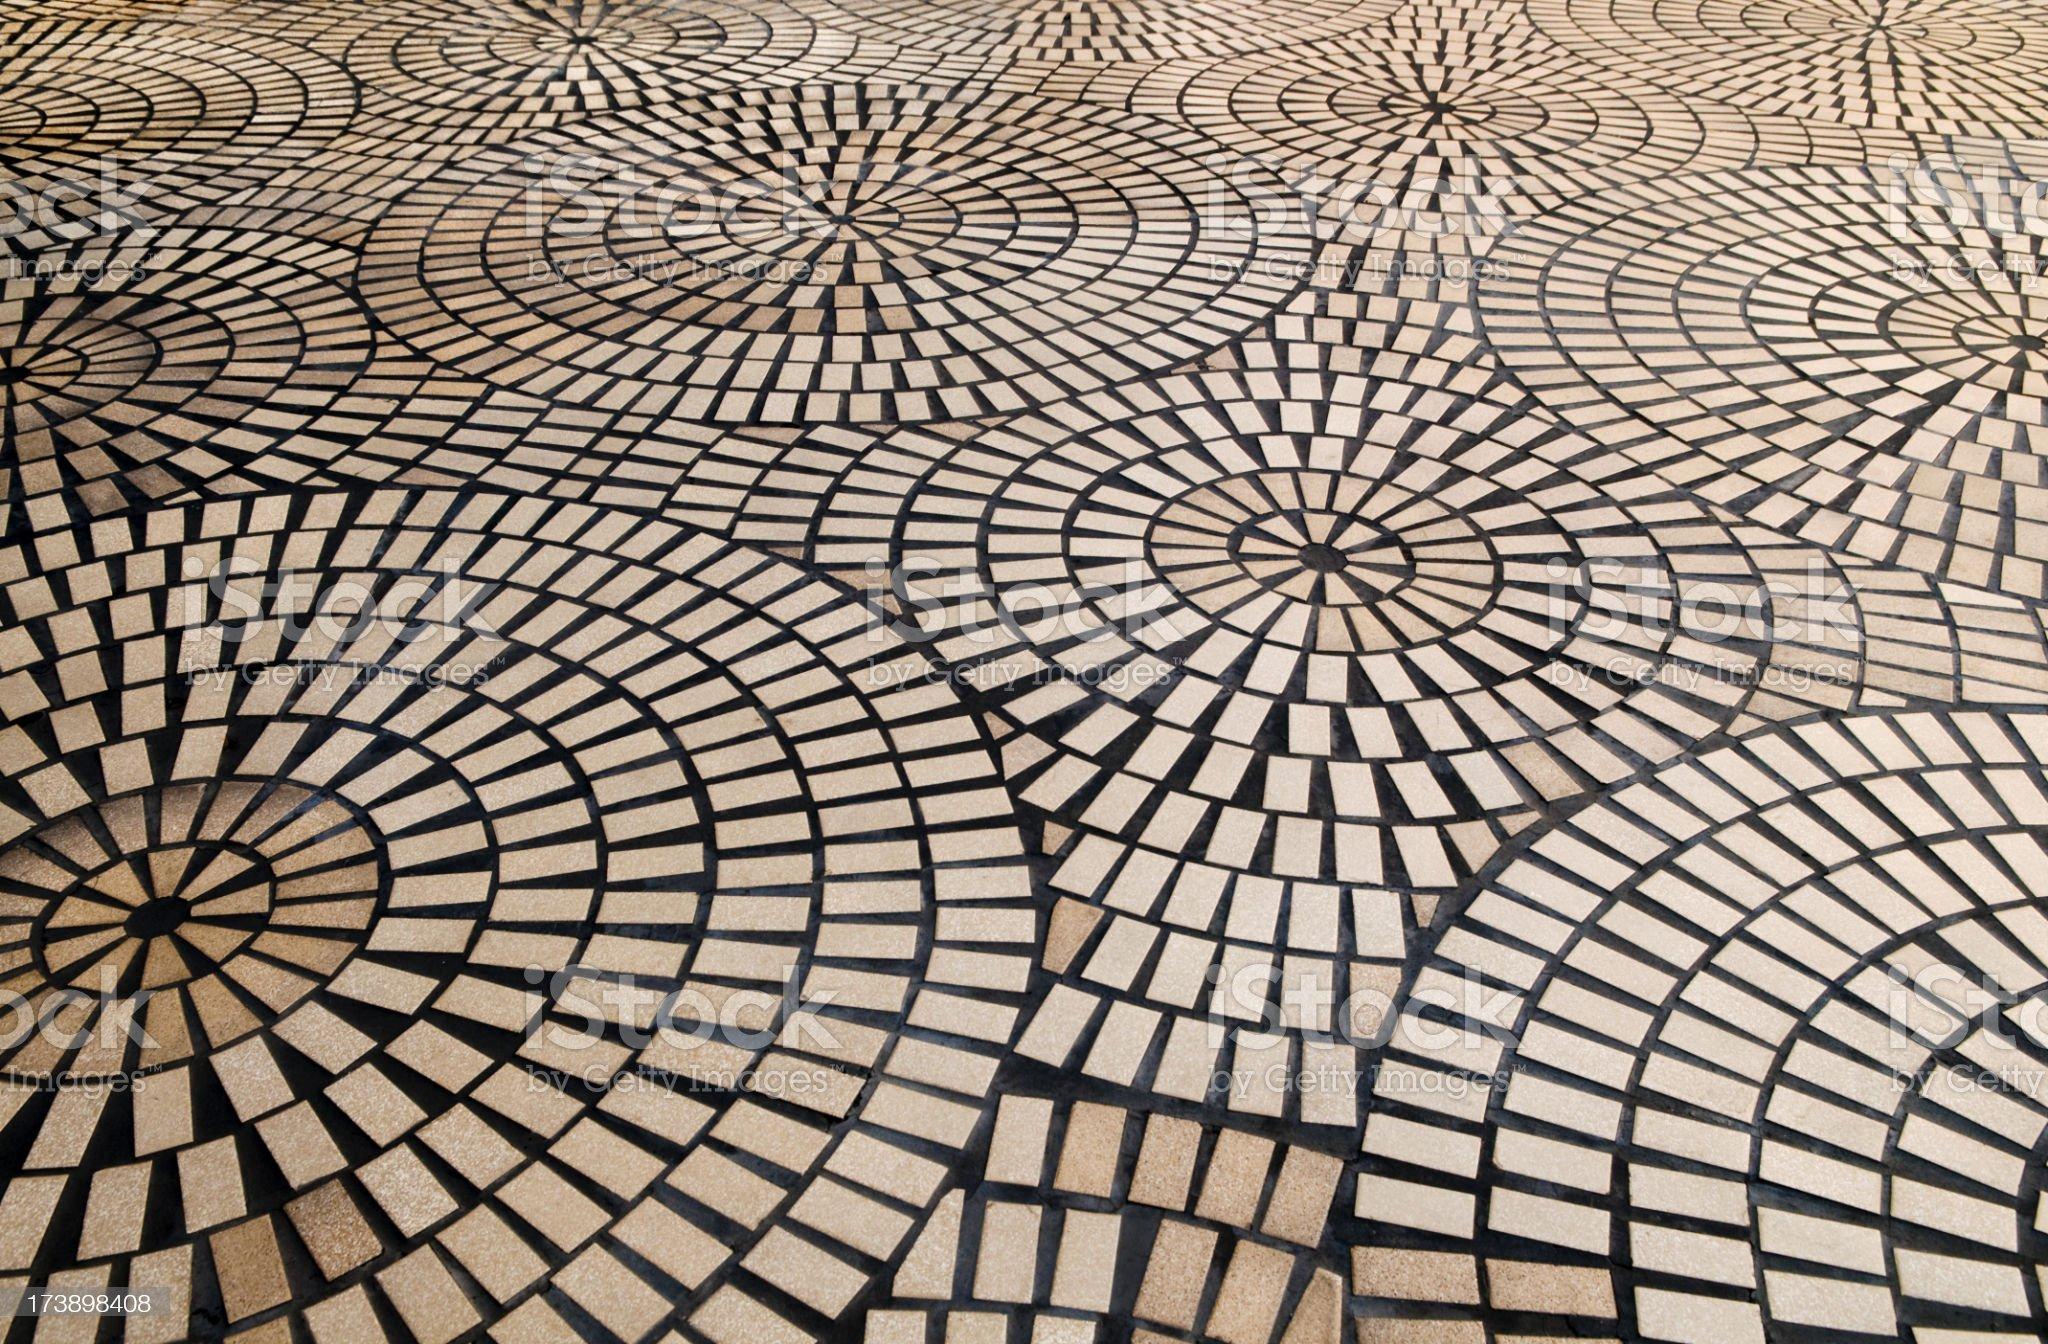 Circular Tile Background royalty-free stock photo